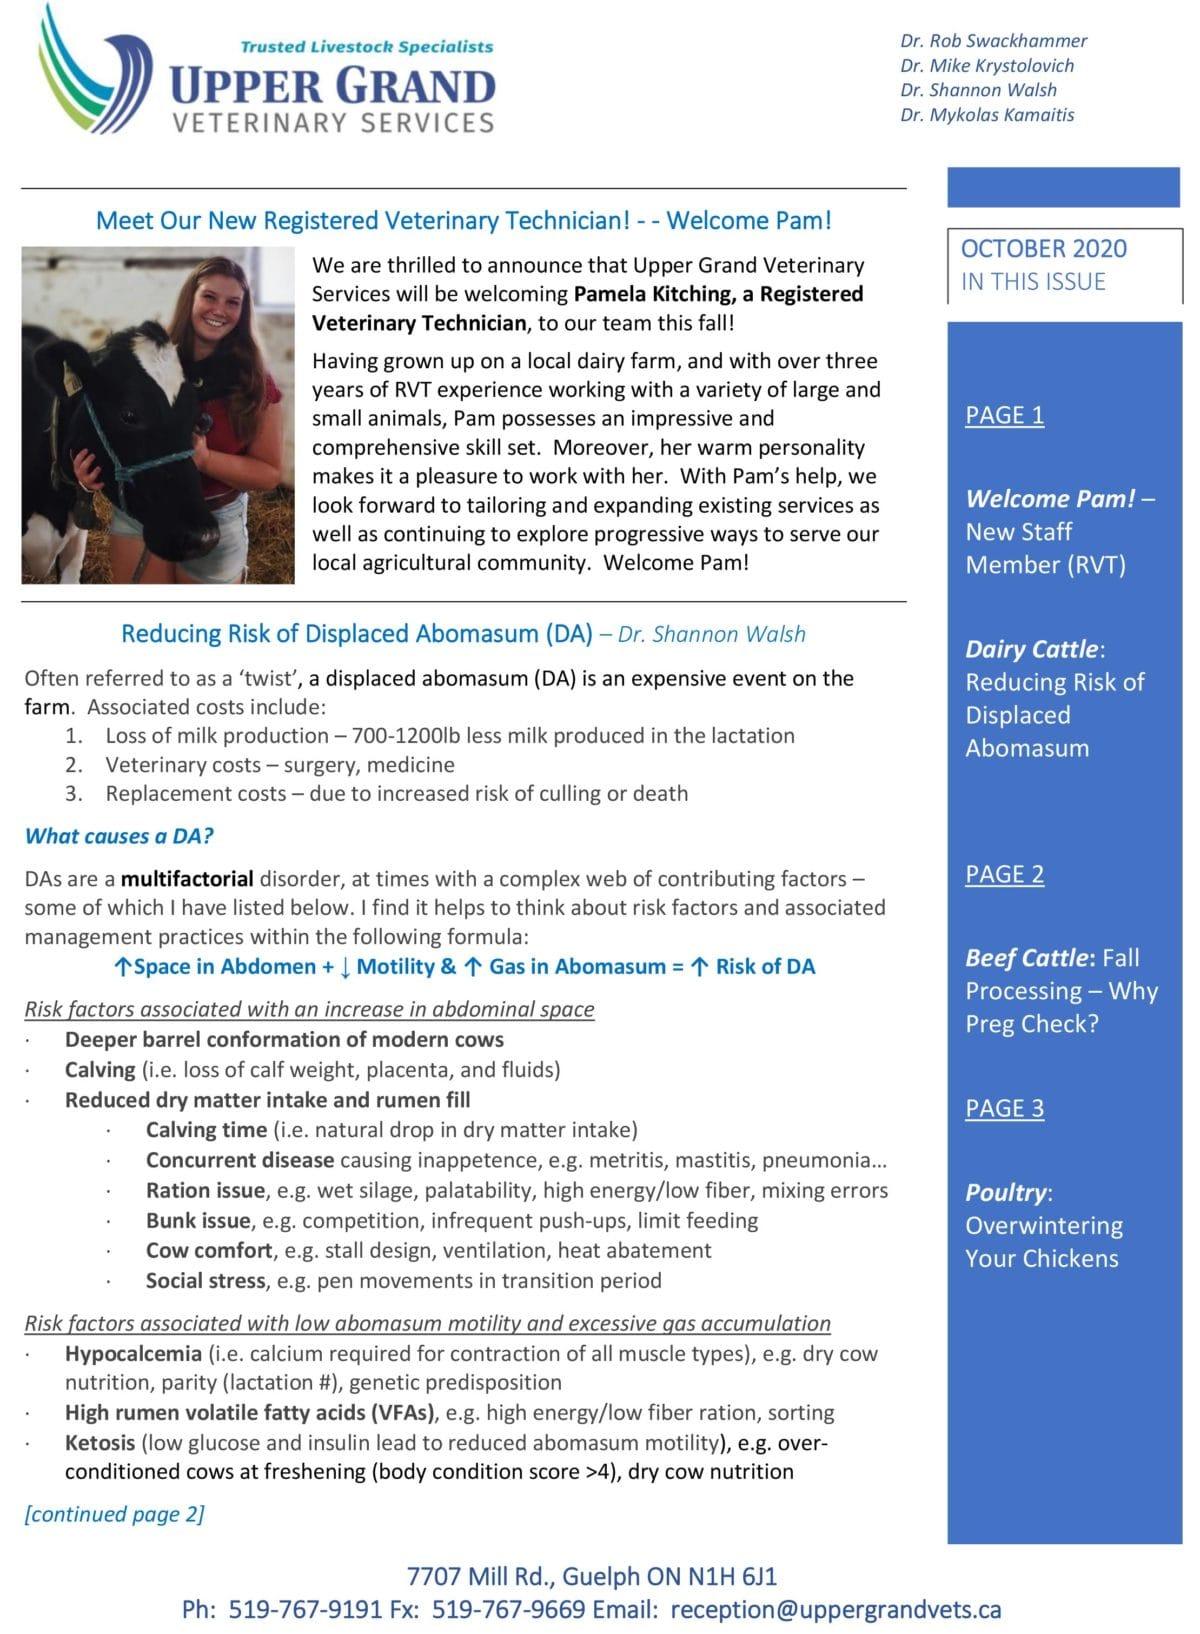 UGVS-Newsletter_10-2020_02-1200x1634.jpg